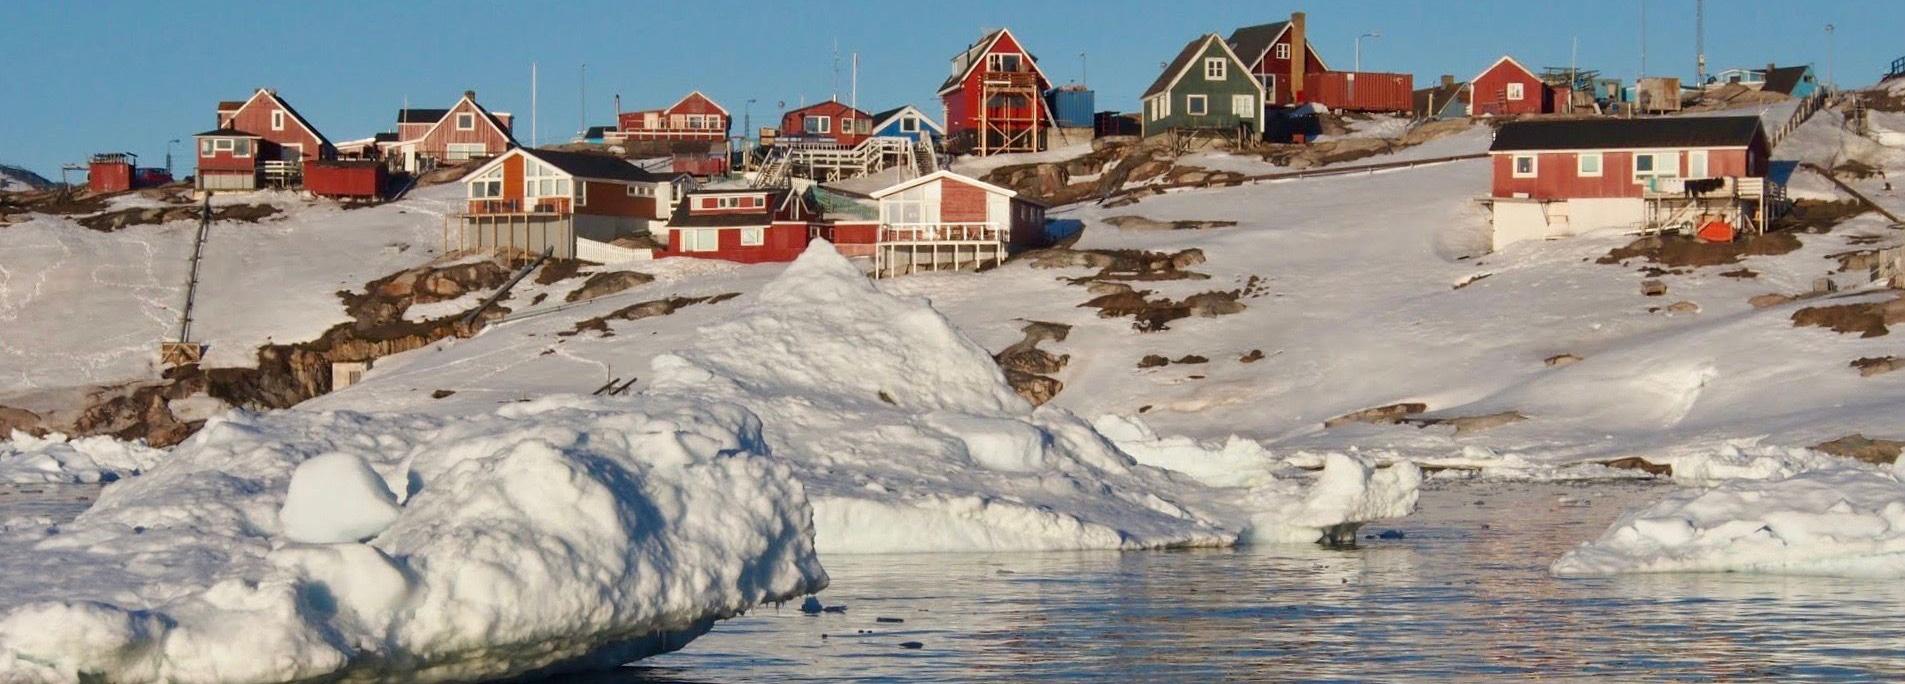 Houses near the Greenland coast